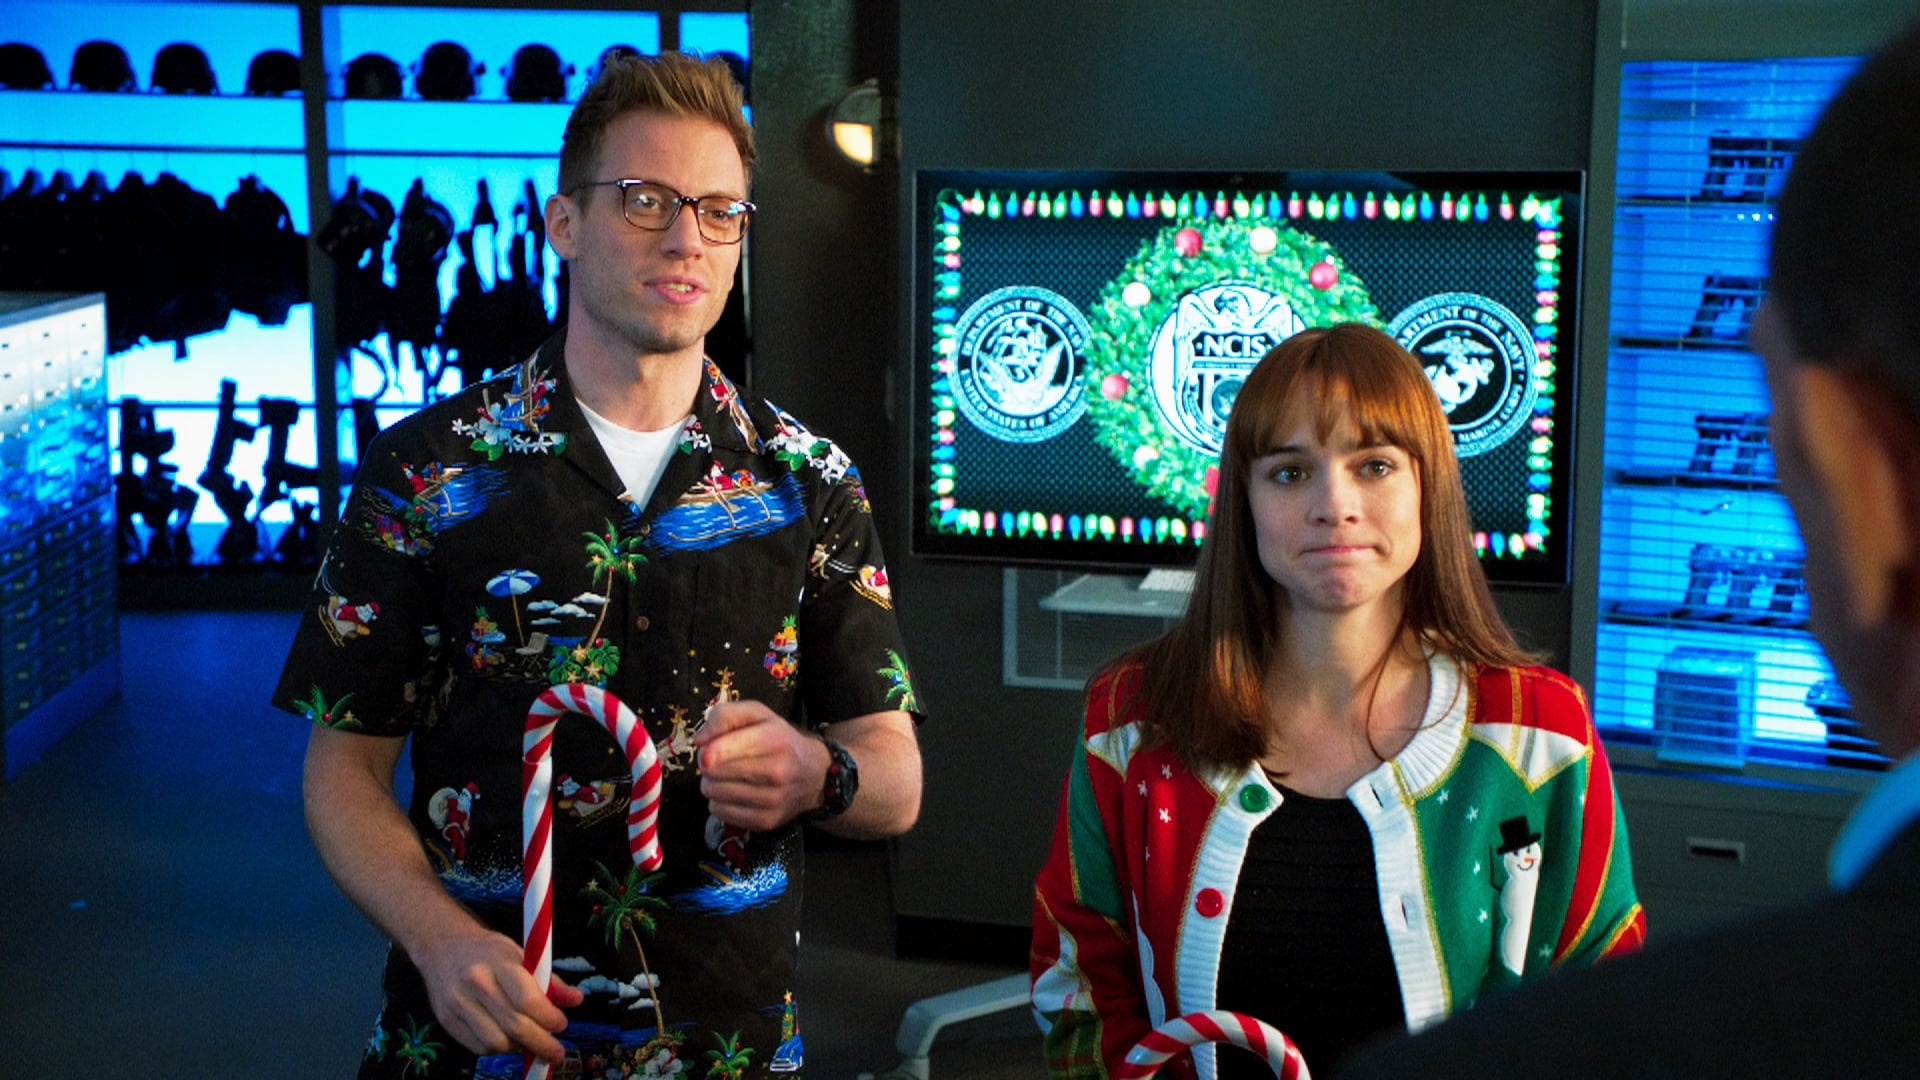 NCIS: Los Angeles Season 7 :Episode 11  Cancel Christmas